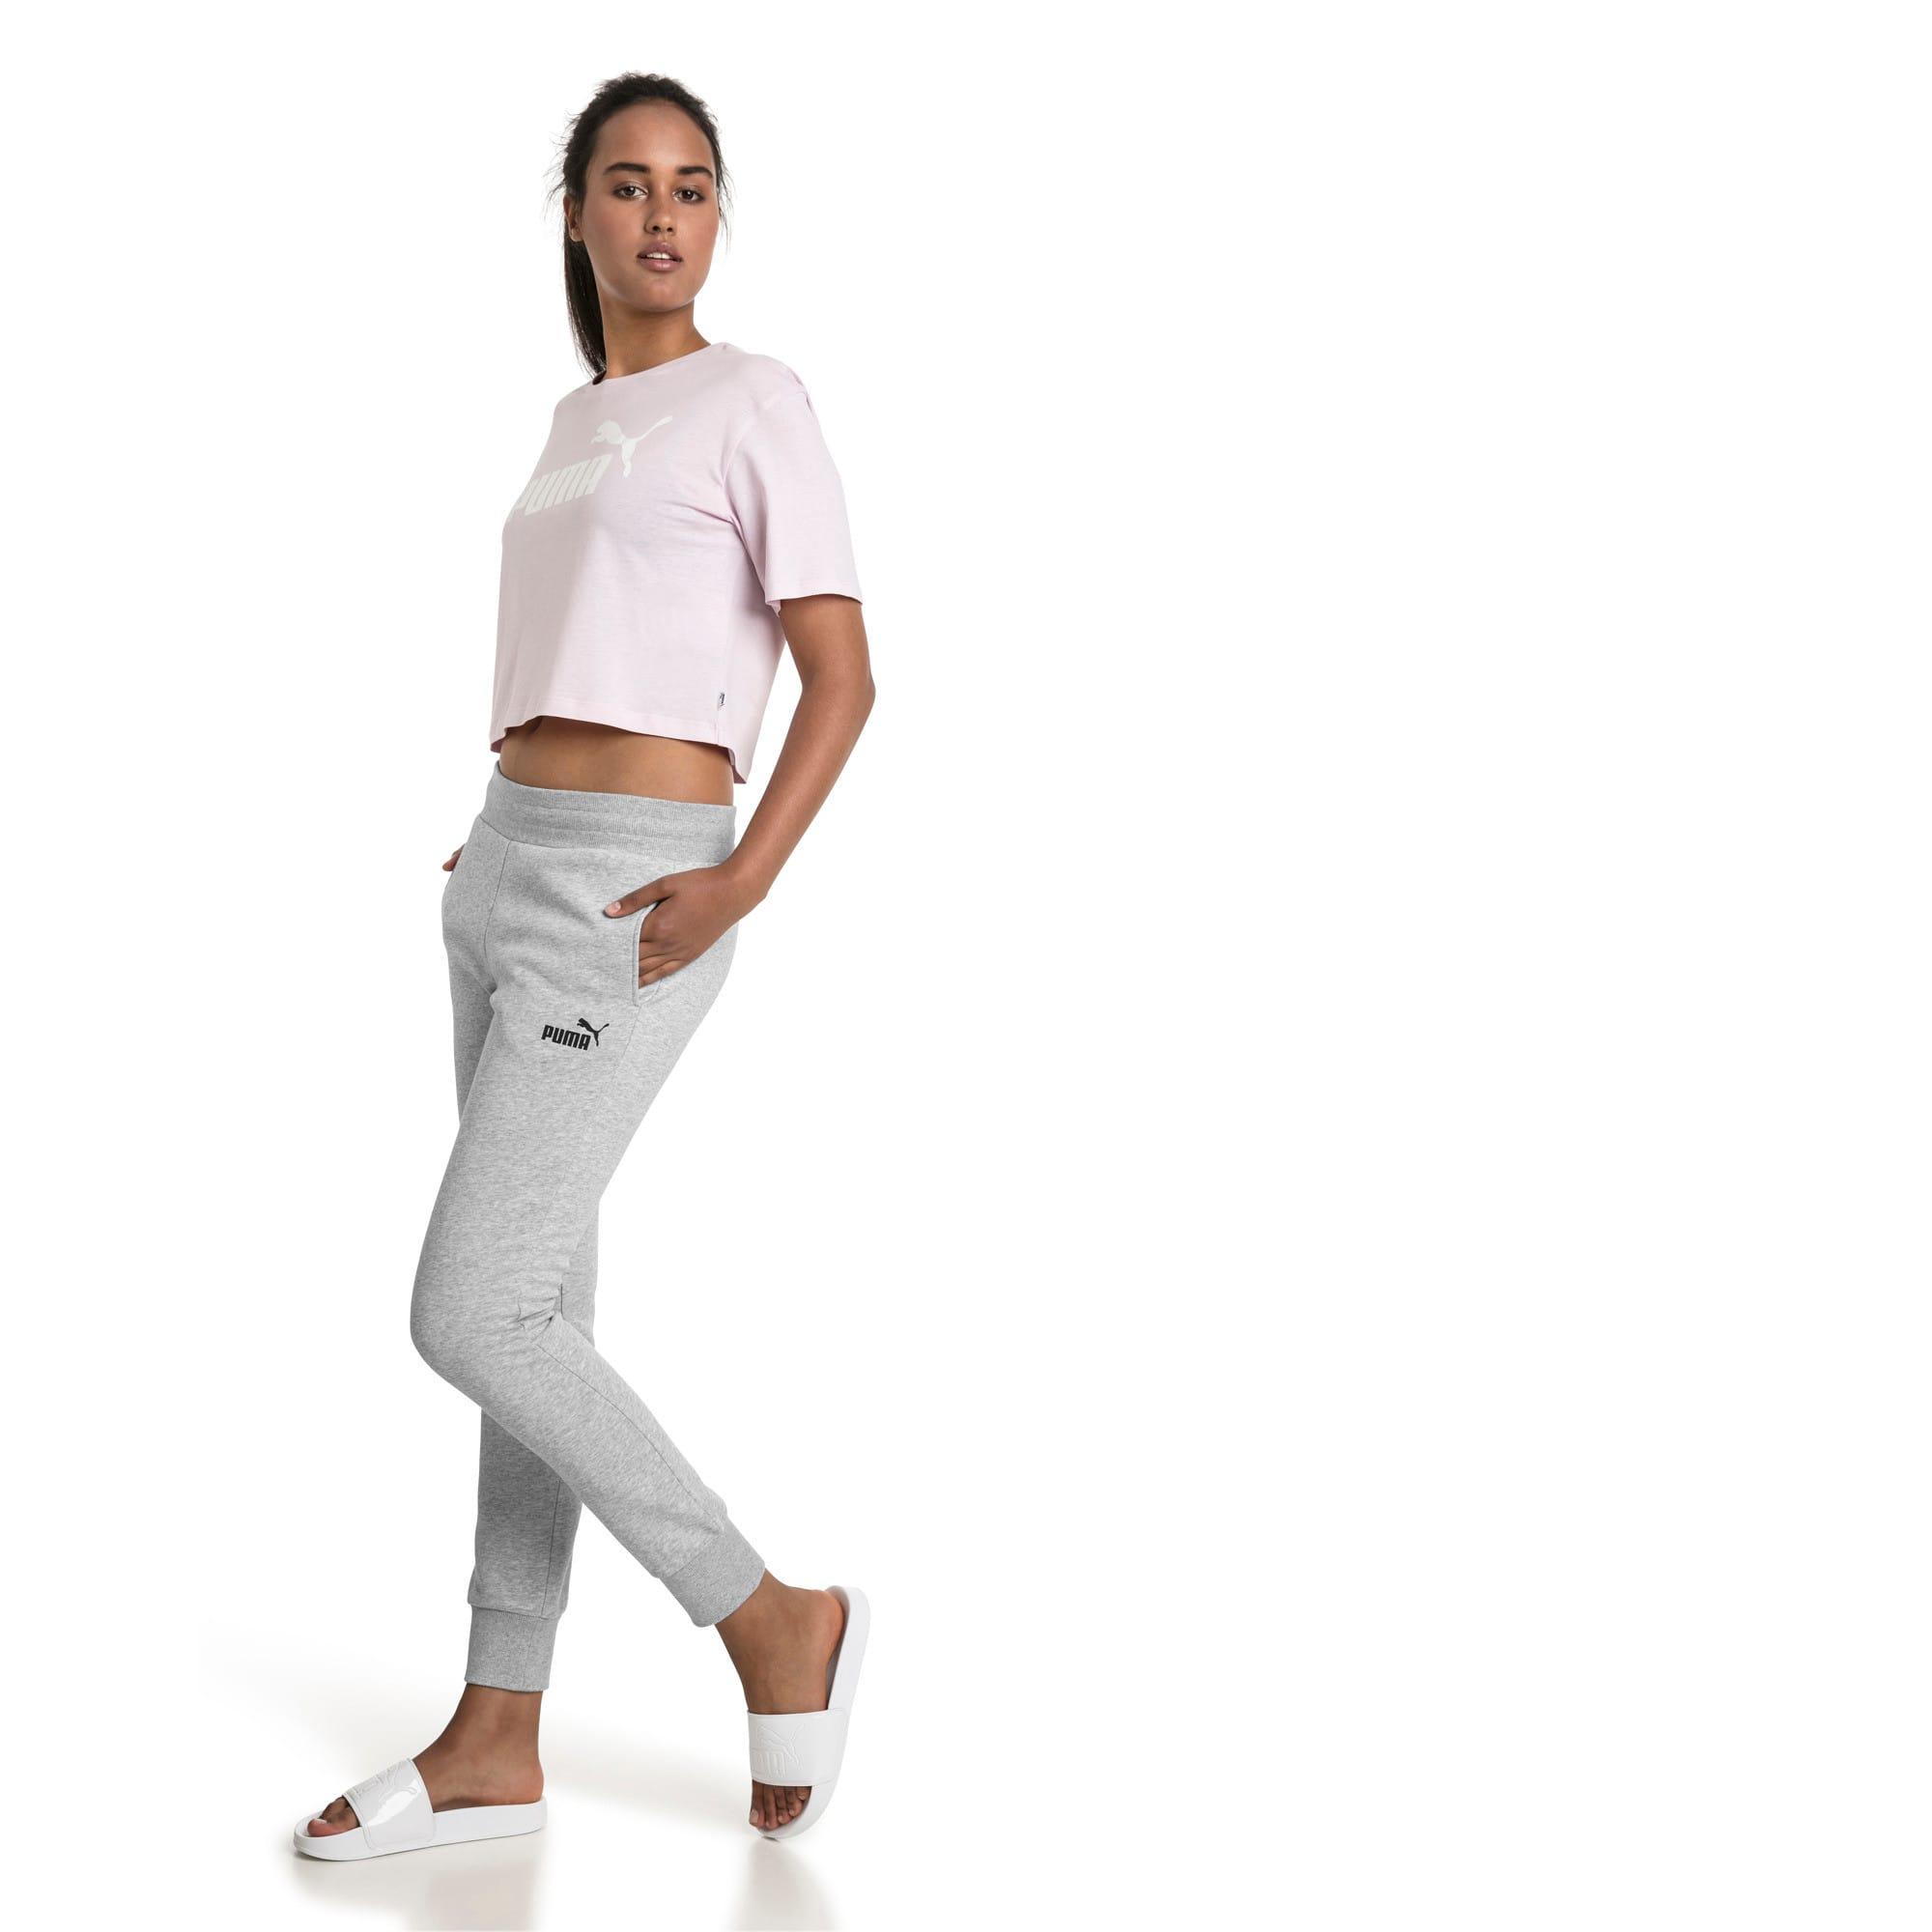 Thumbnail 3 of Essentials Fleece Women's Pants, Light Gray Heather, medium